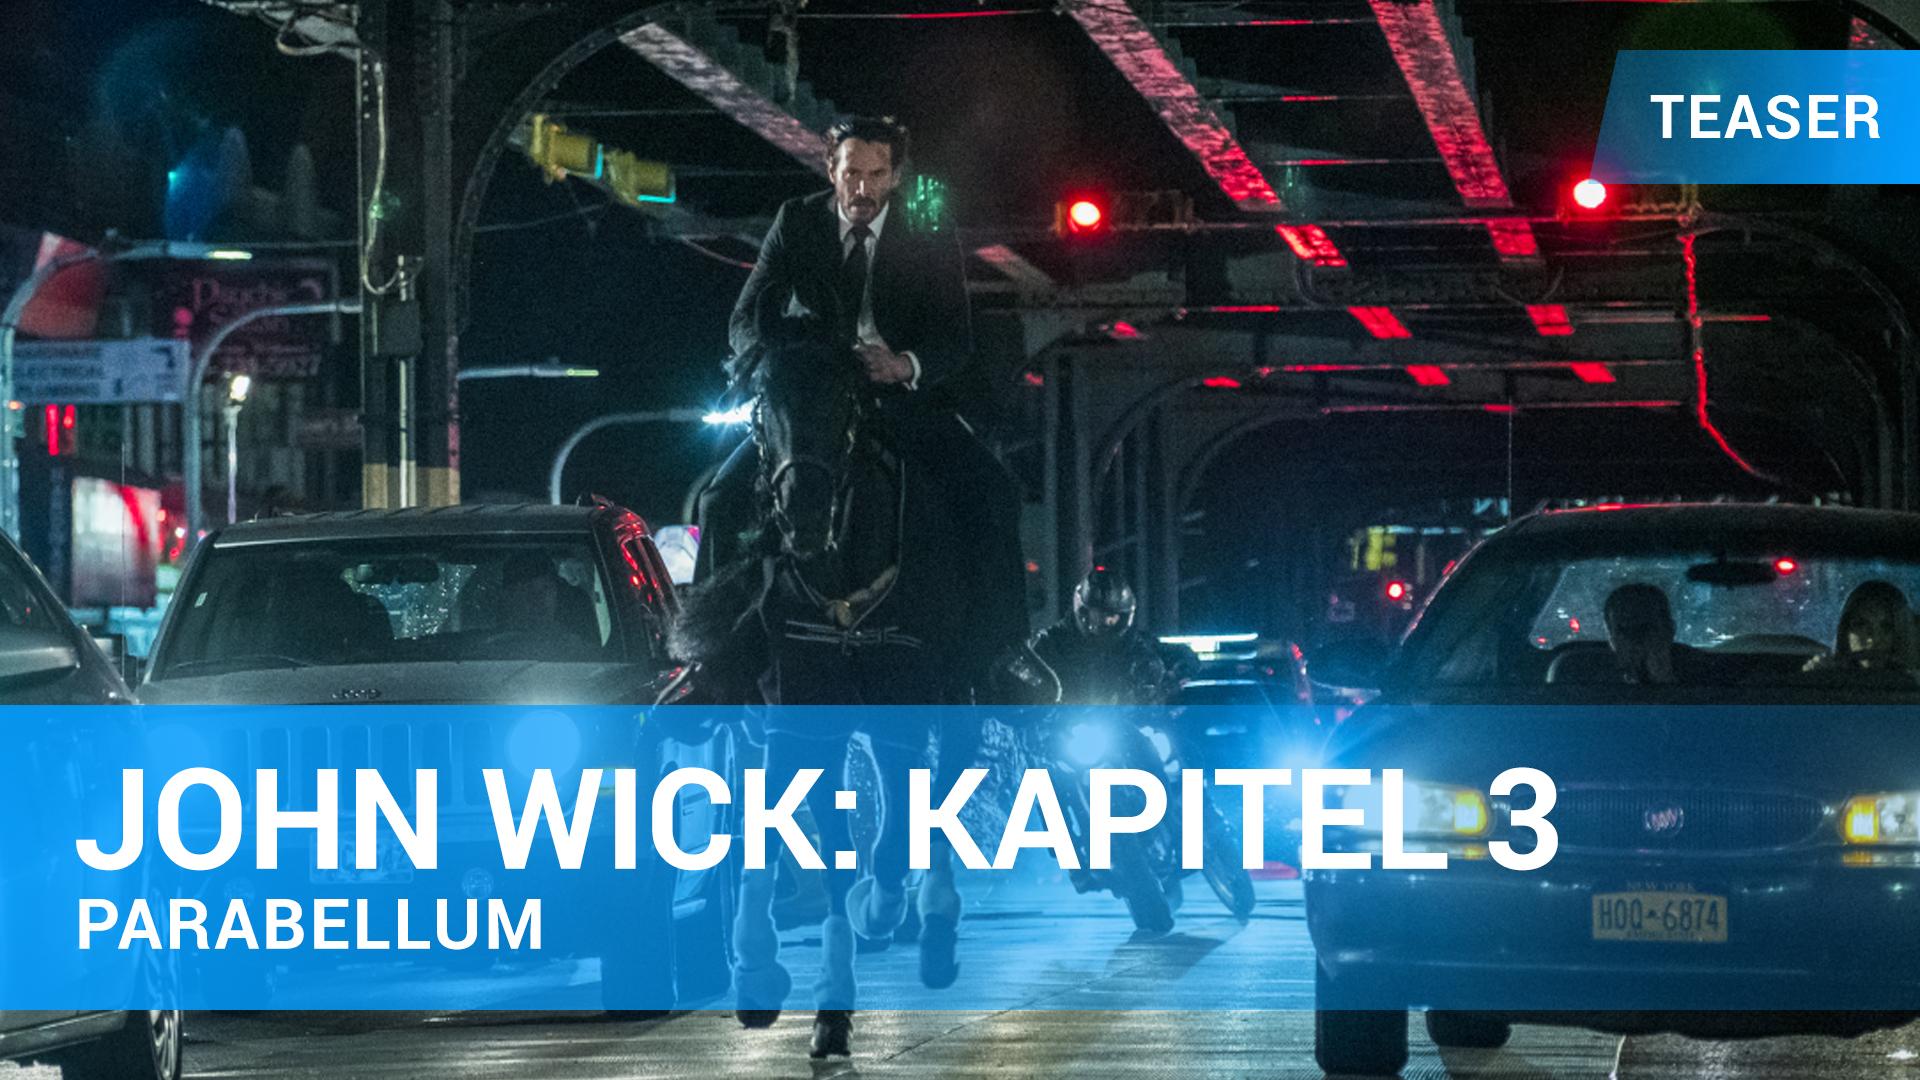 John Wick: Kapitel 3 Teaser Trailer Deutsch